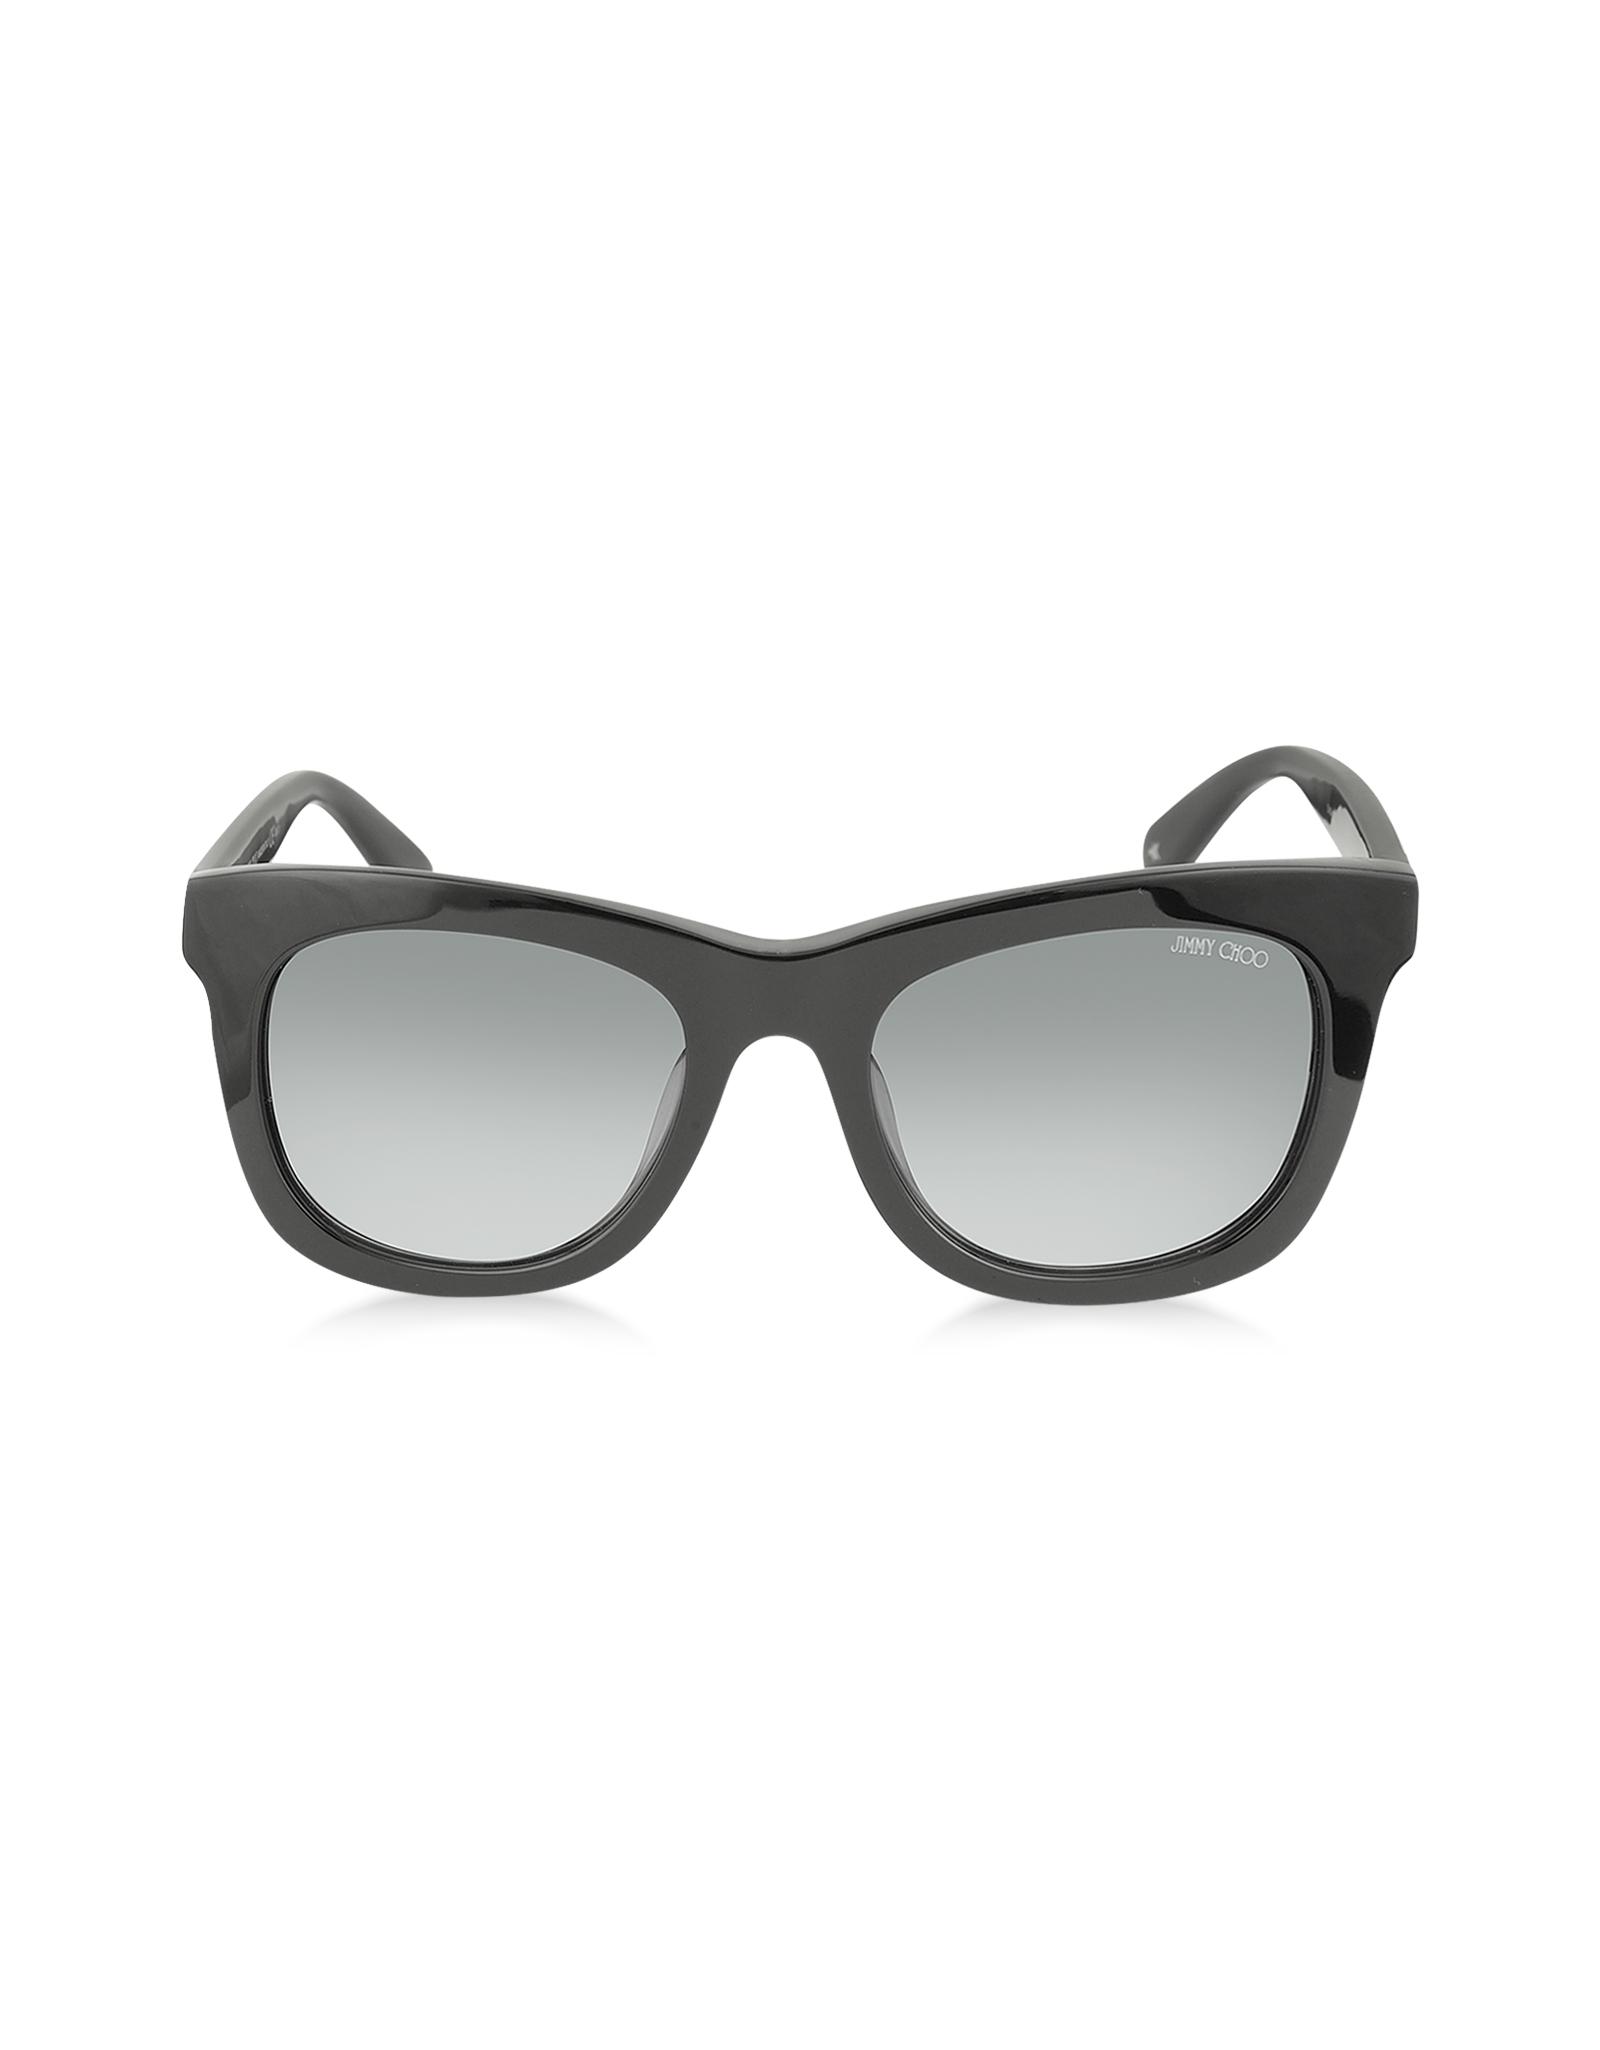 e6732b4c968 Jimmy Choo Sasha S 807Hd Black Square Frame Sunglasses With Silver ...